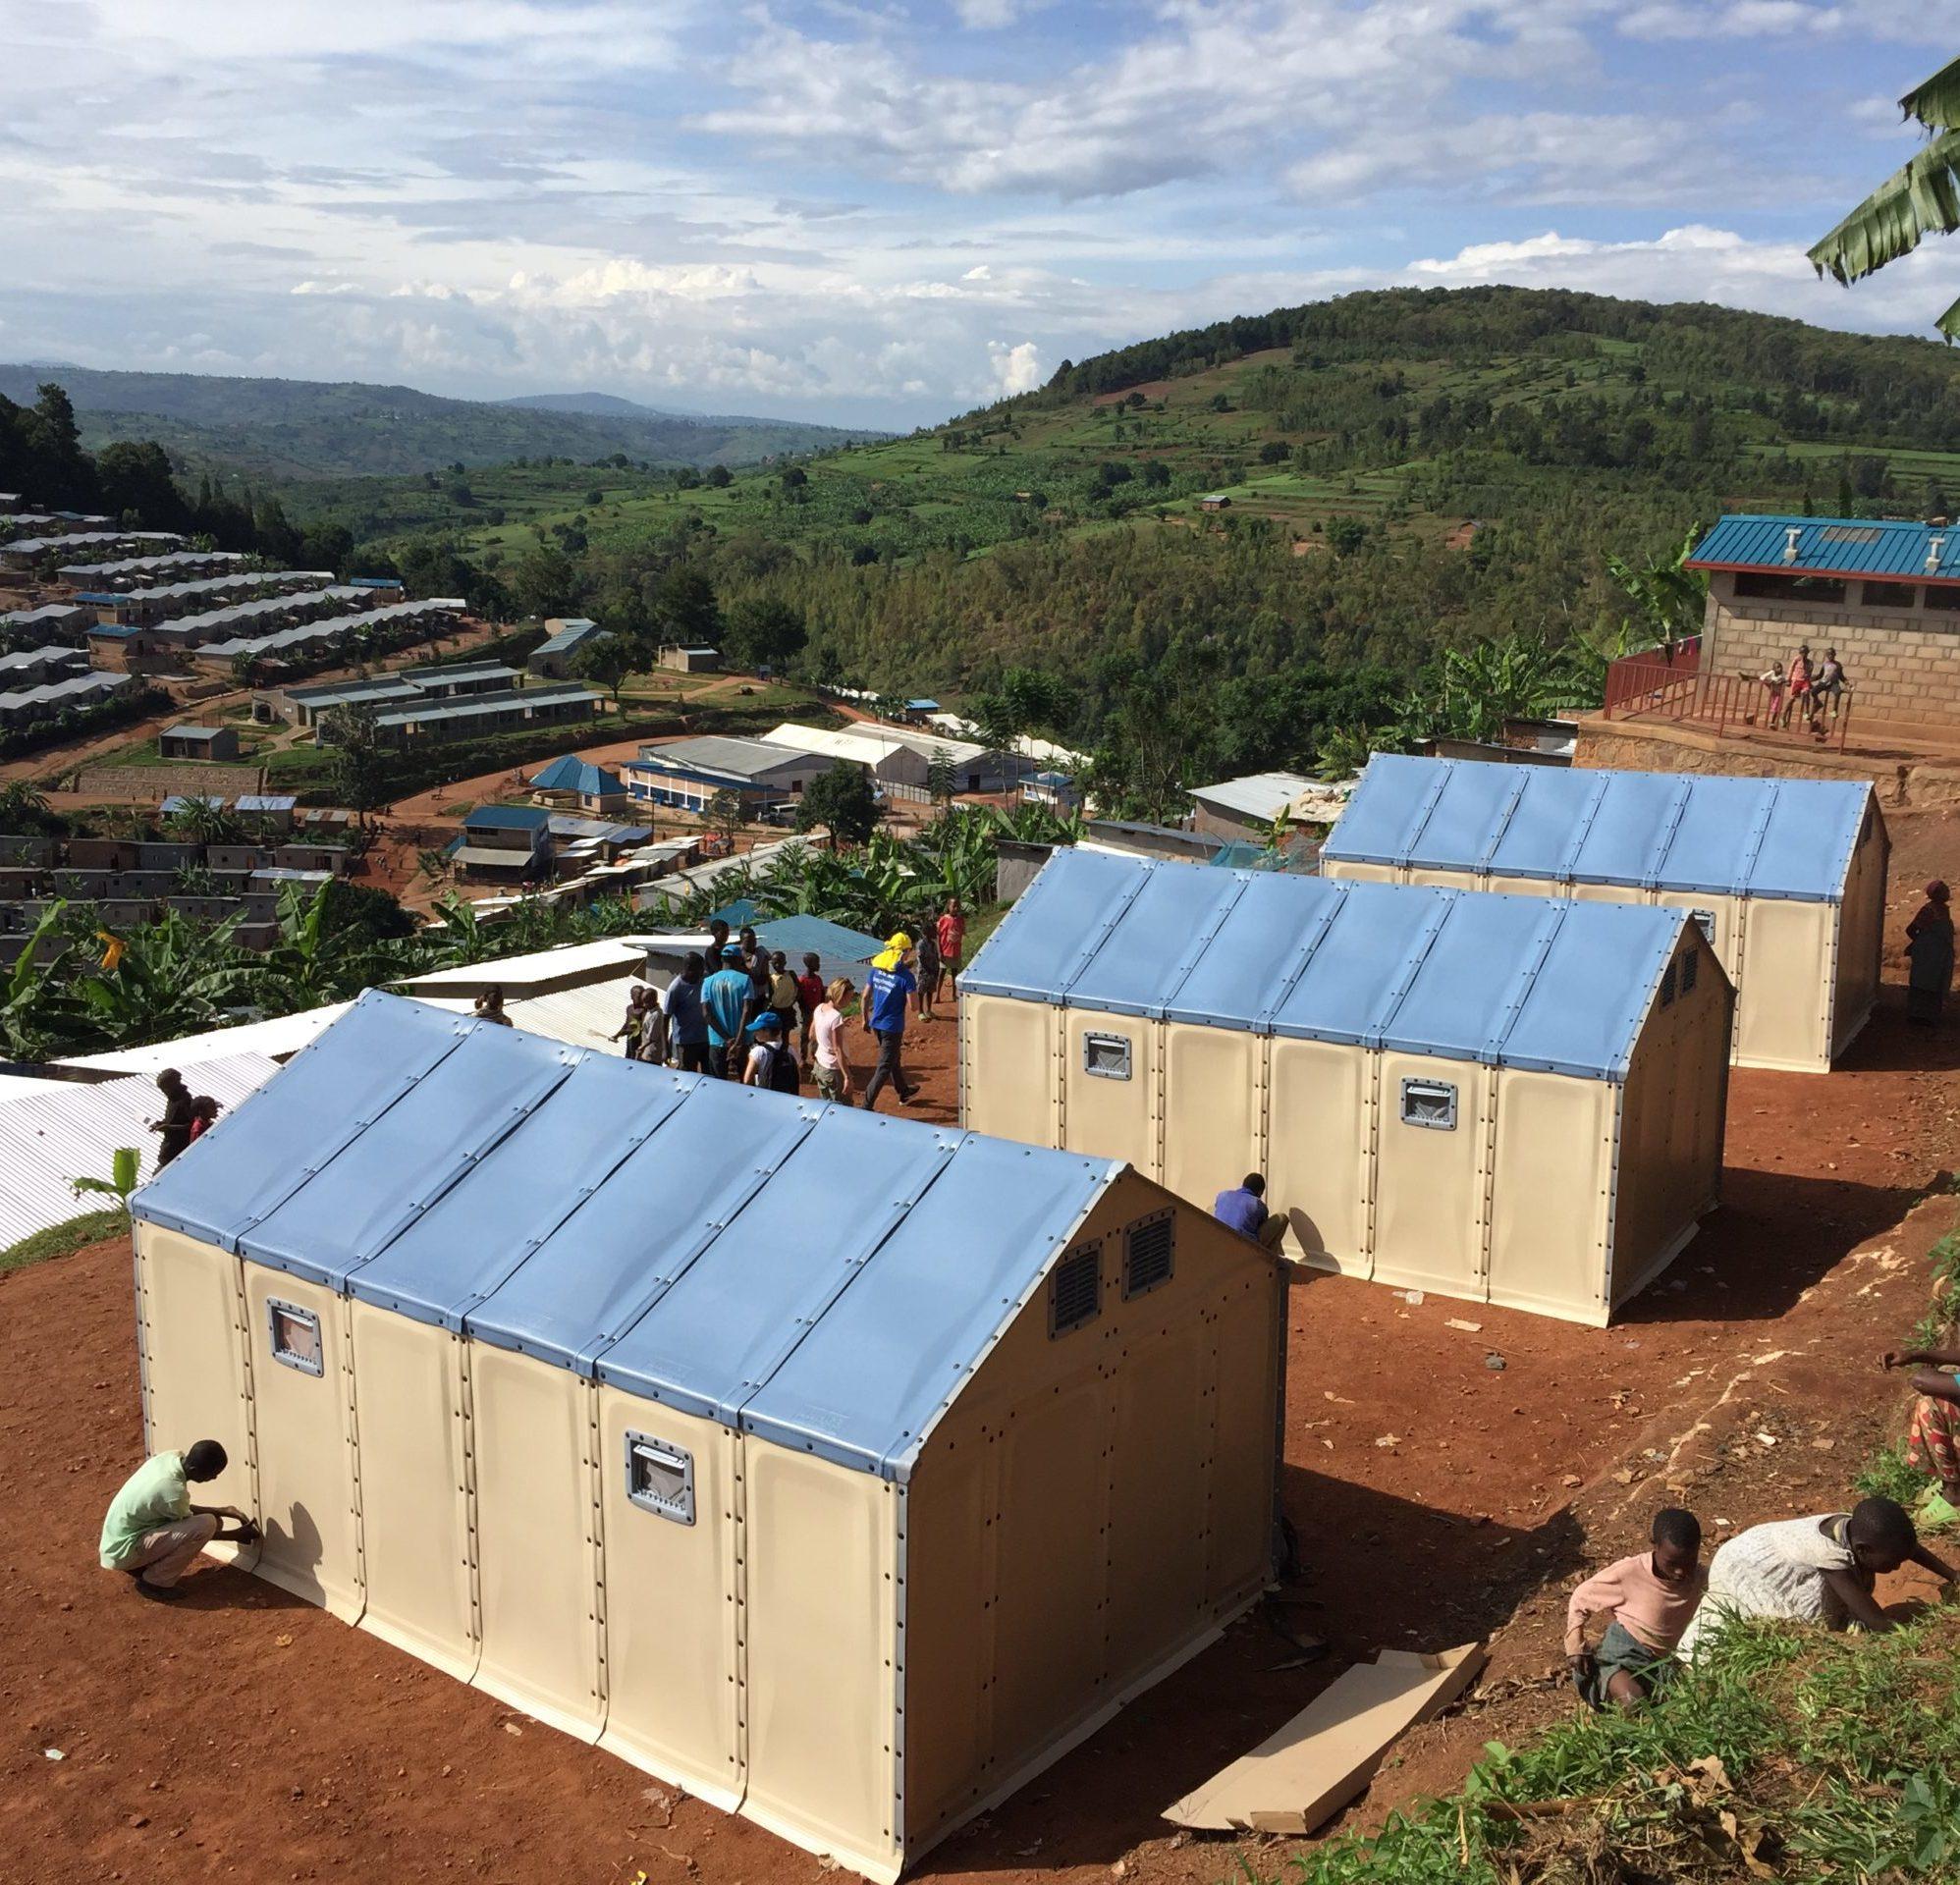 Photo du projet Refugee Housing Unit (RHU) de UNHCR